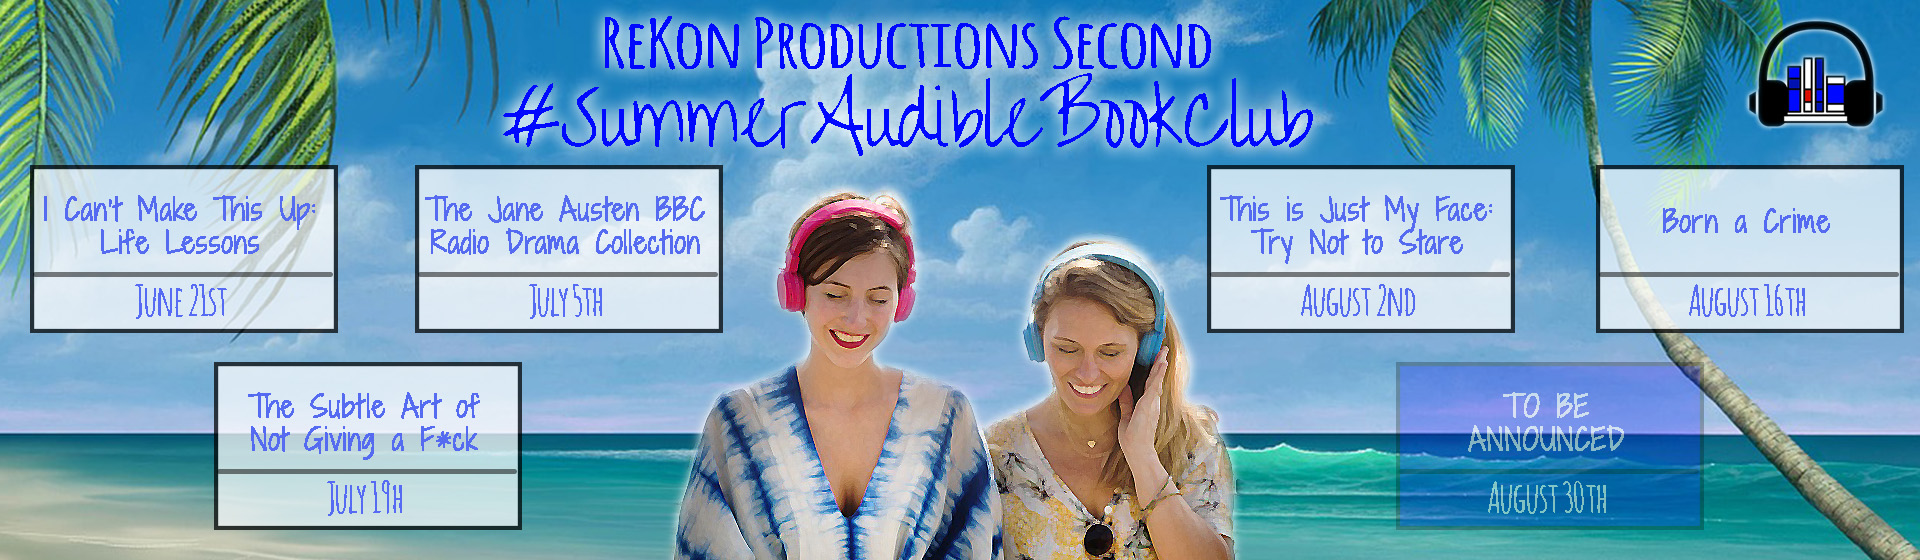 BookClub-Banner-081617